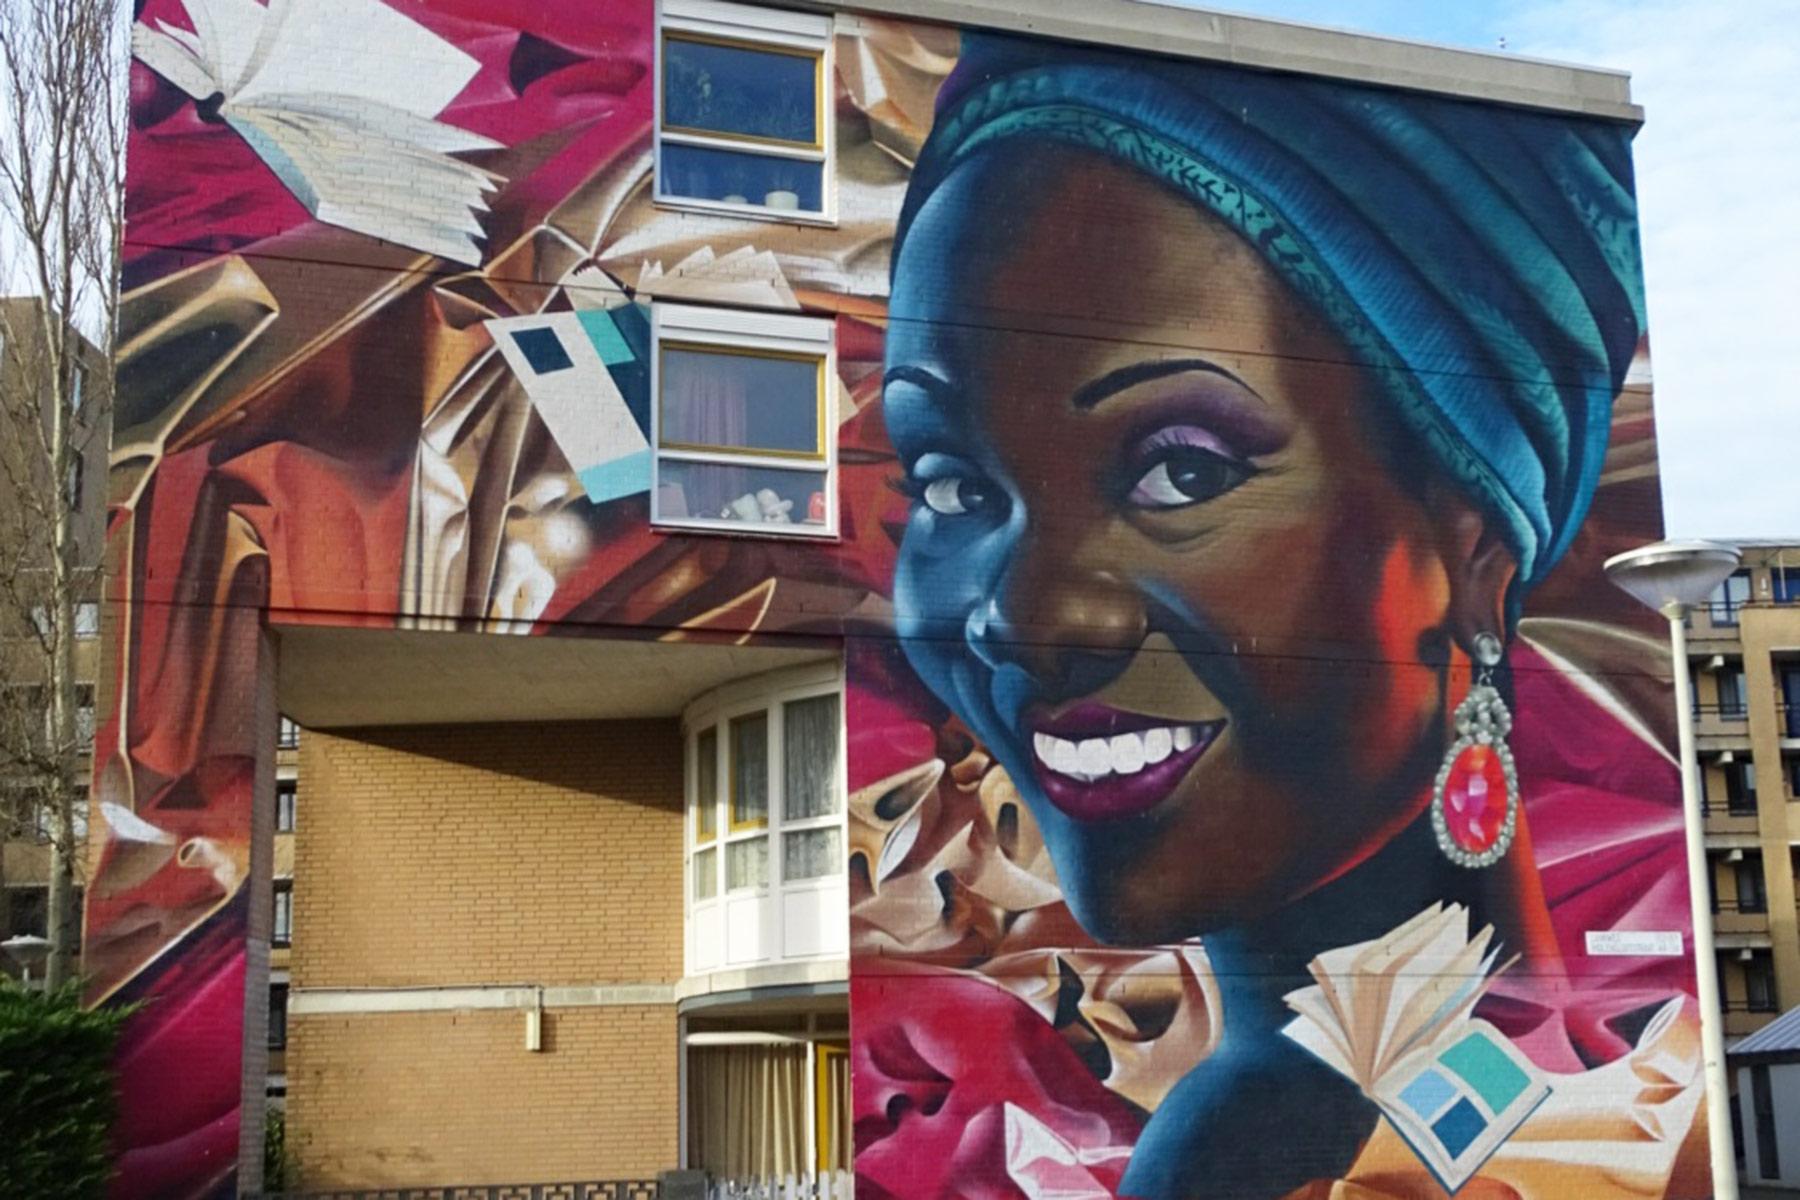 street-art-laakkwartier-moments-of-life